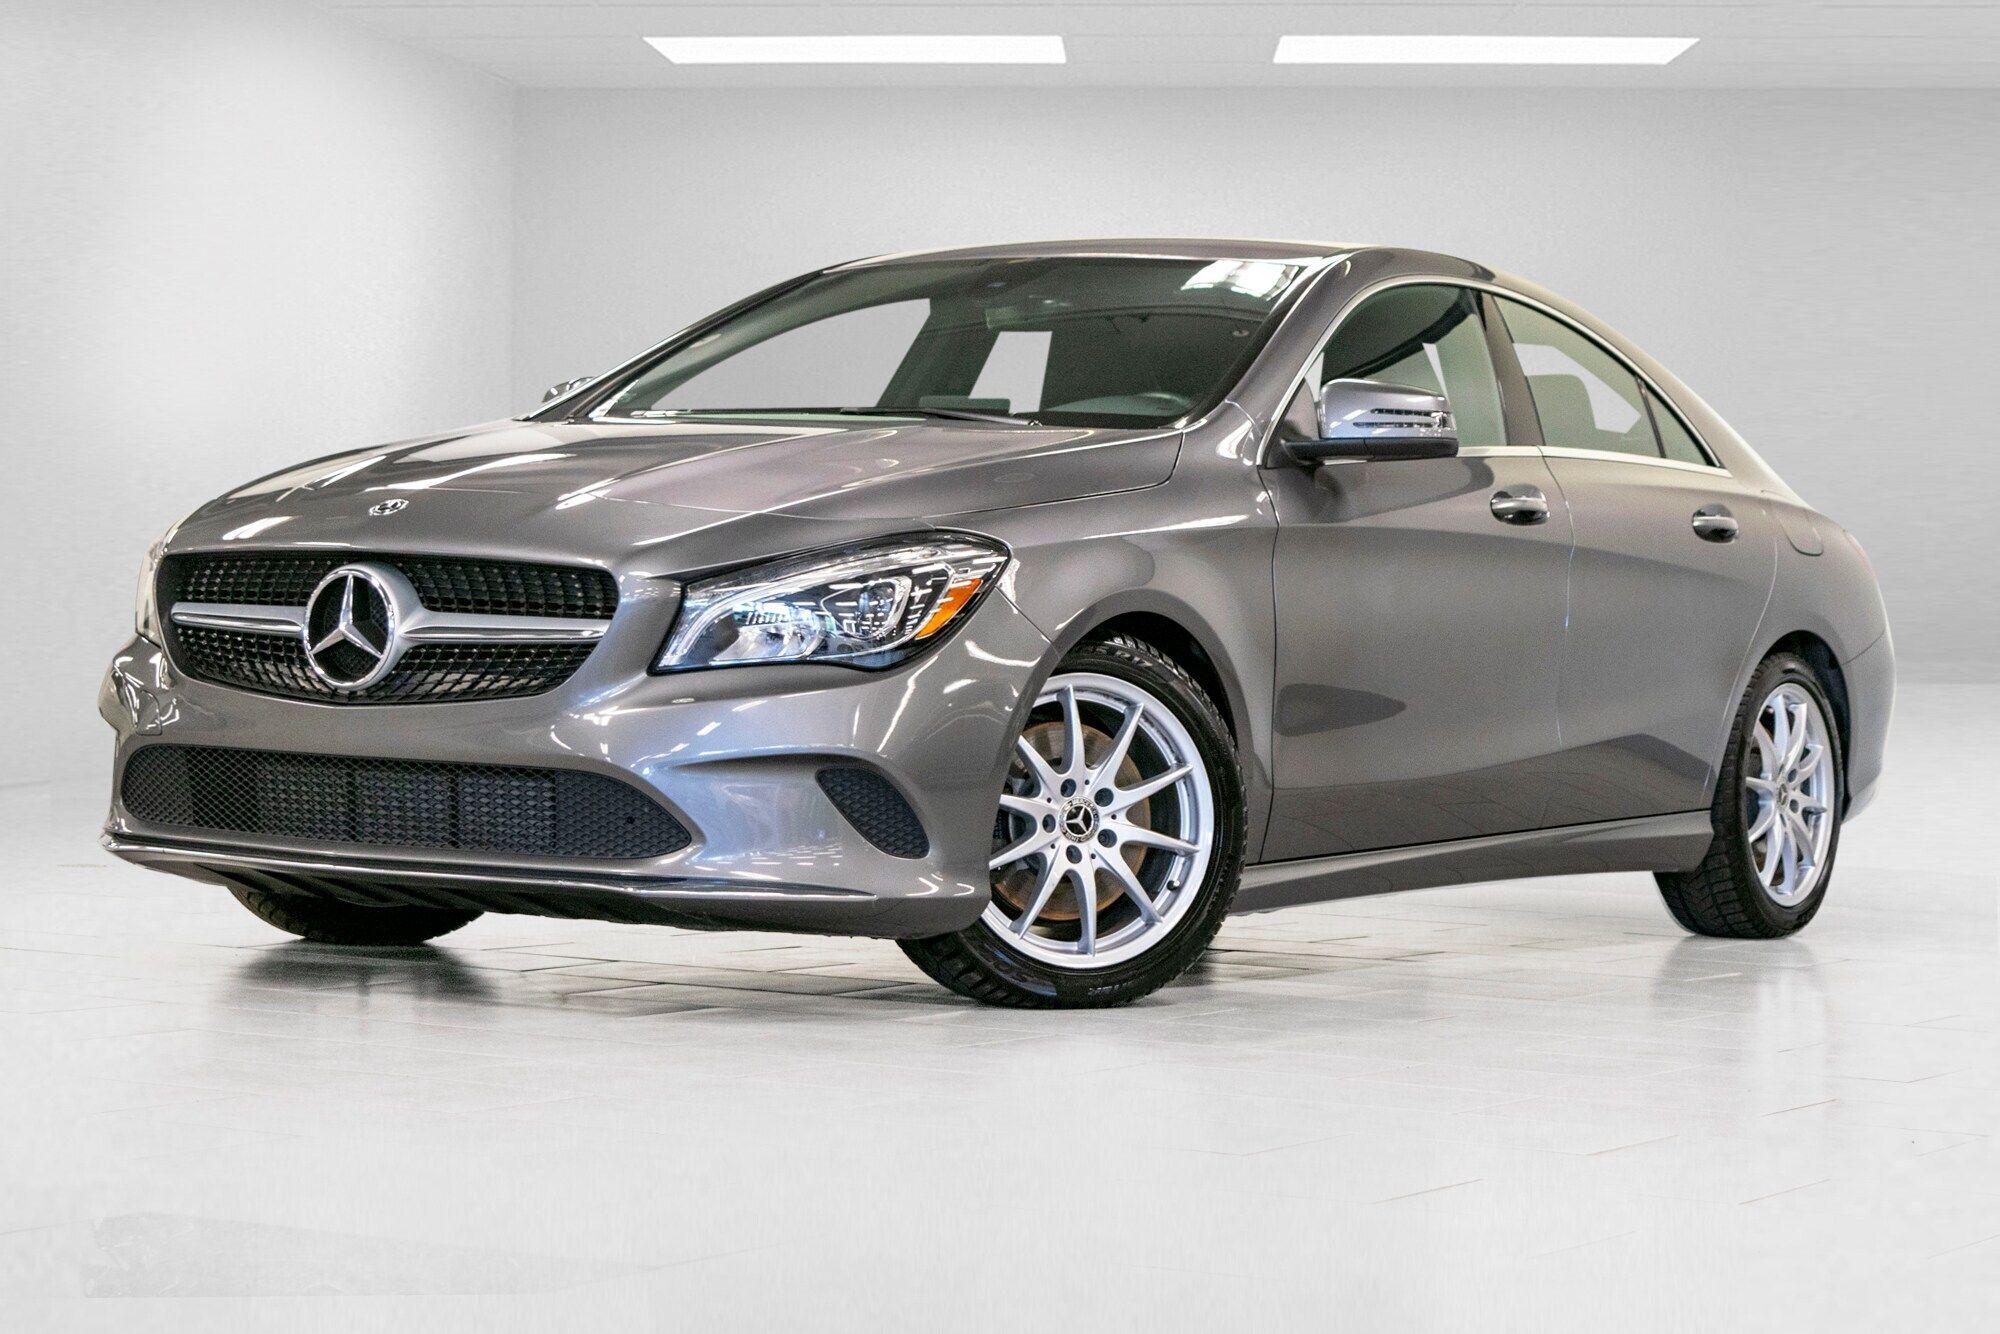 Mercedes-Benz West Island   Pre-owned 2018 Mercedes-Benz CLA